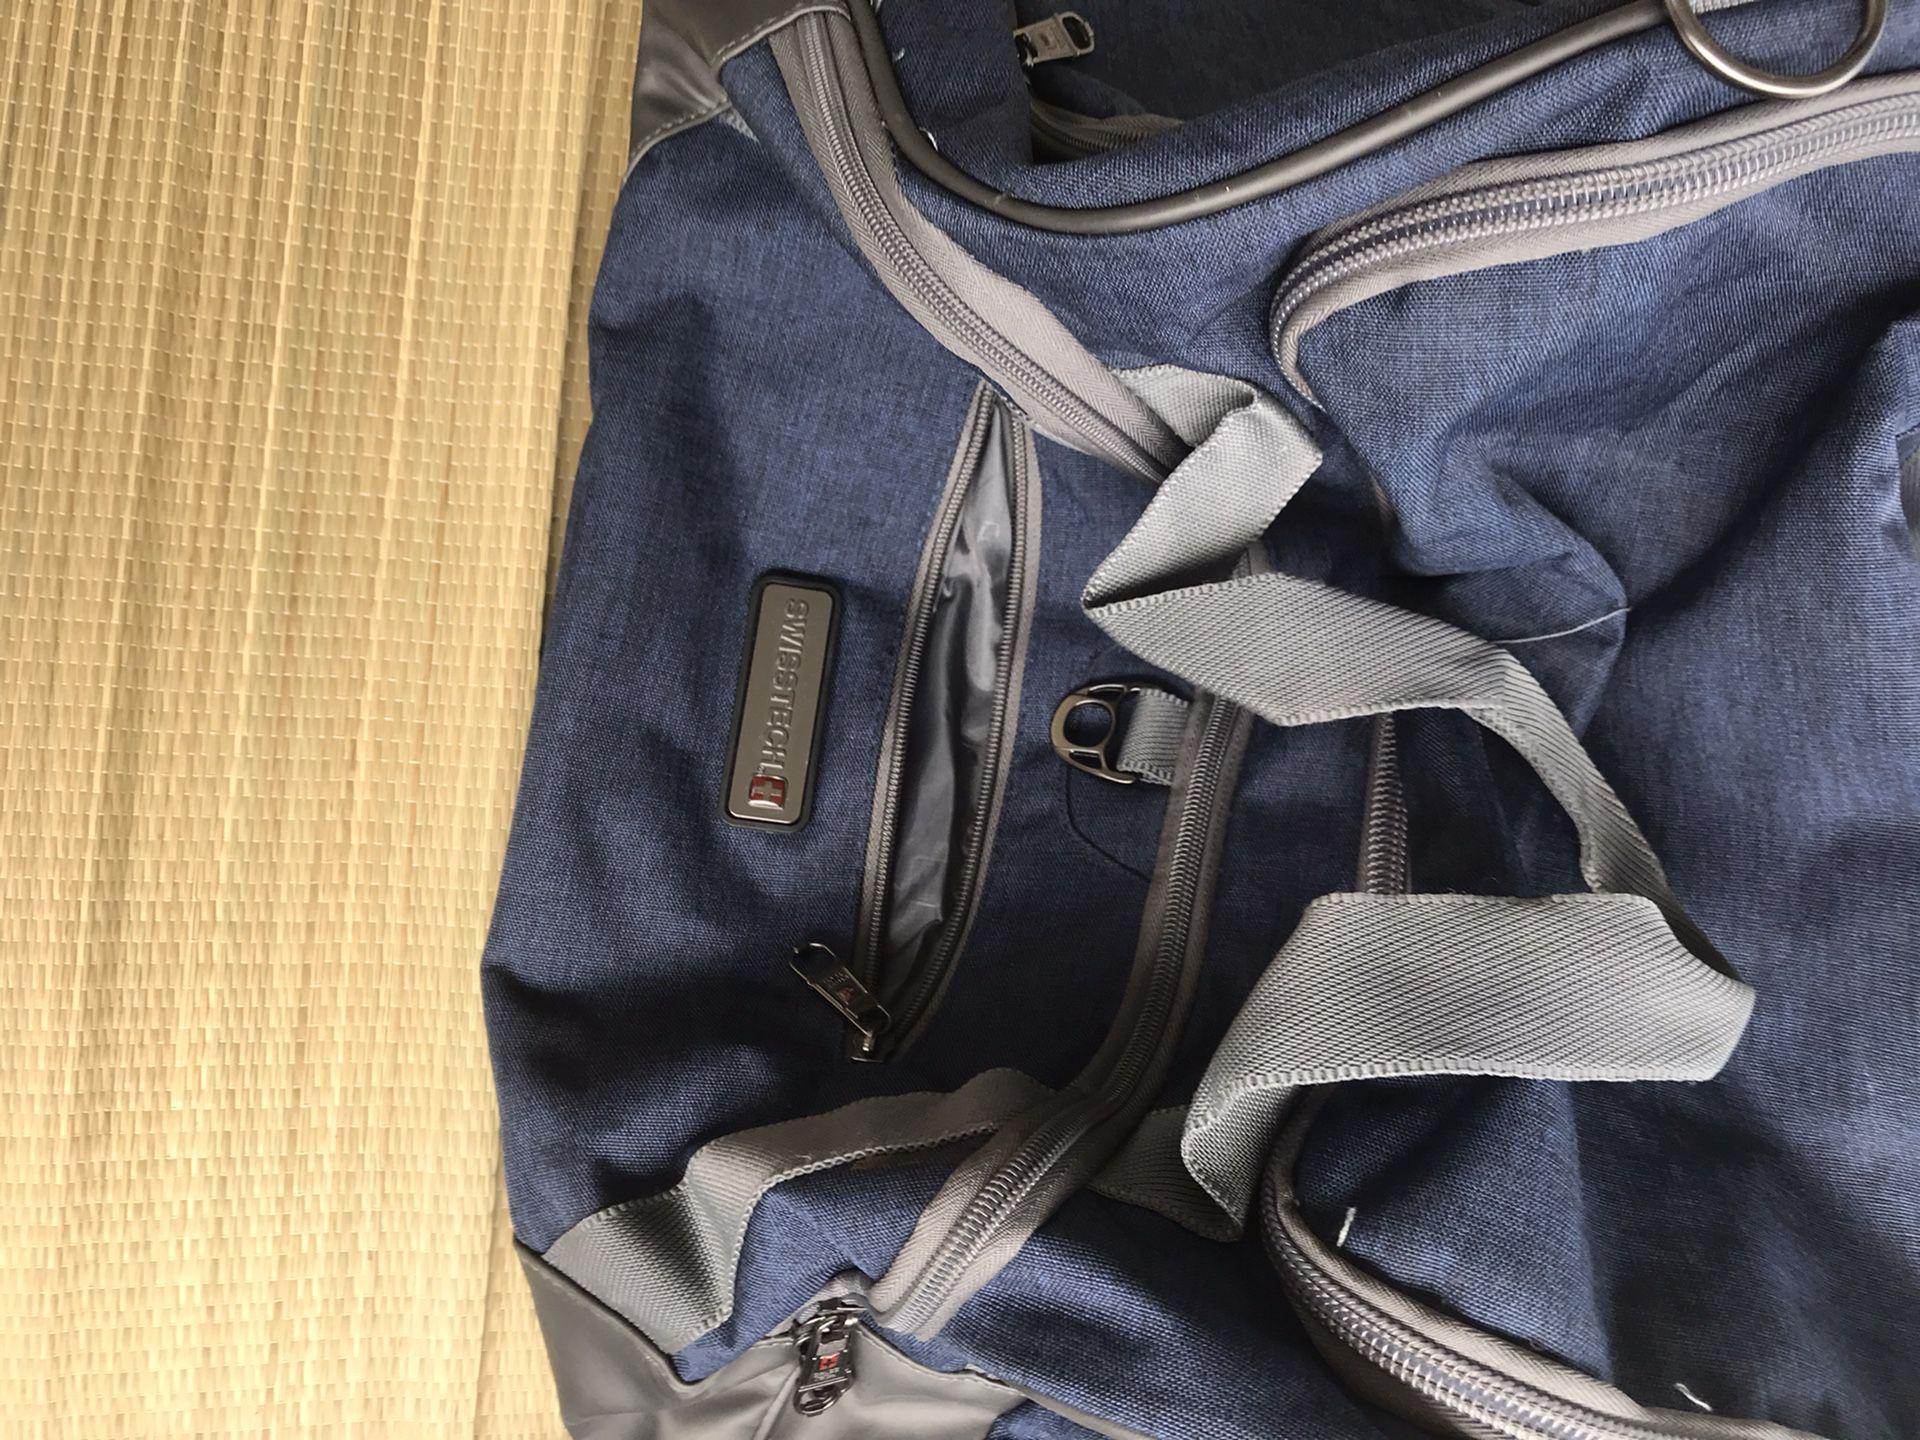 28 Inch Swiss Gear Dueffel Bag